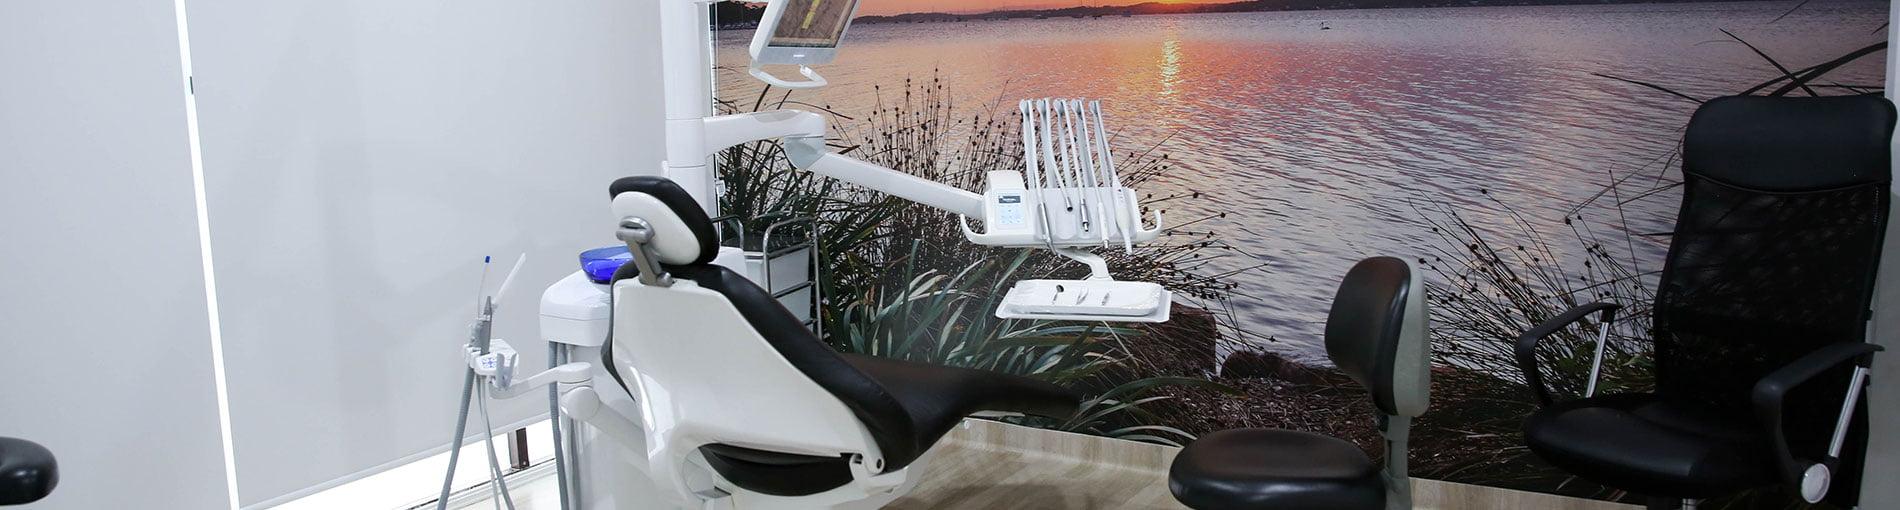 Our Dental Clinic